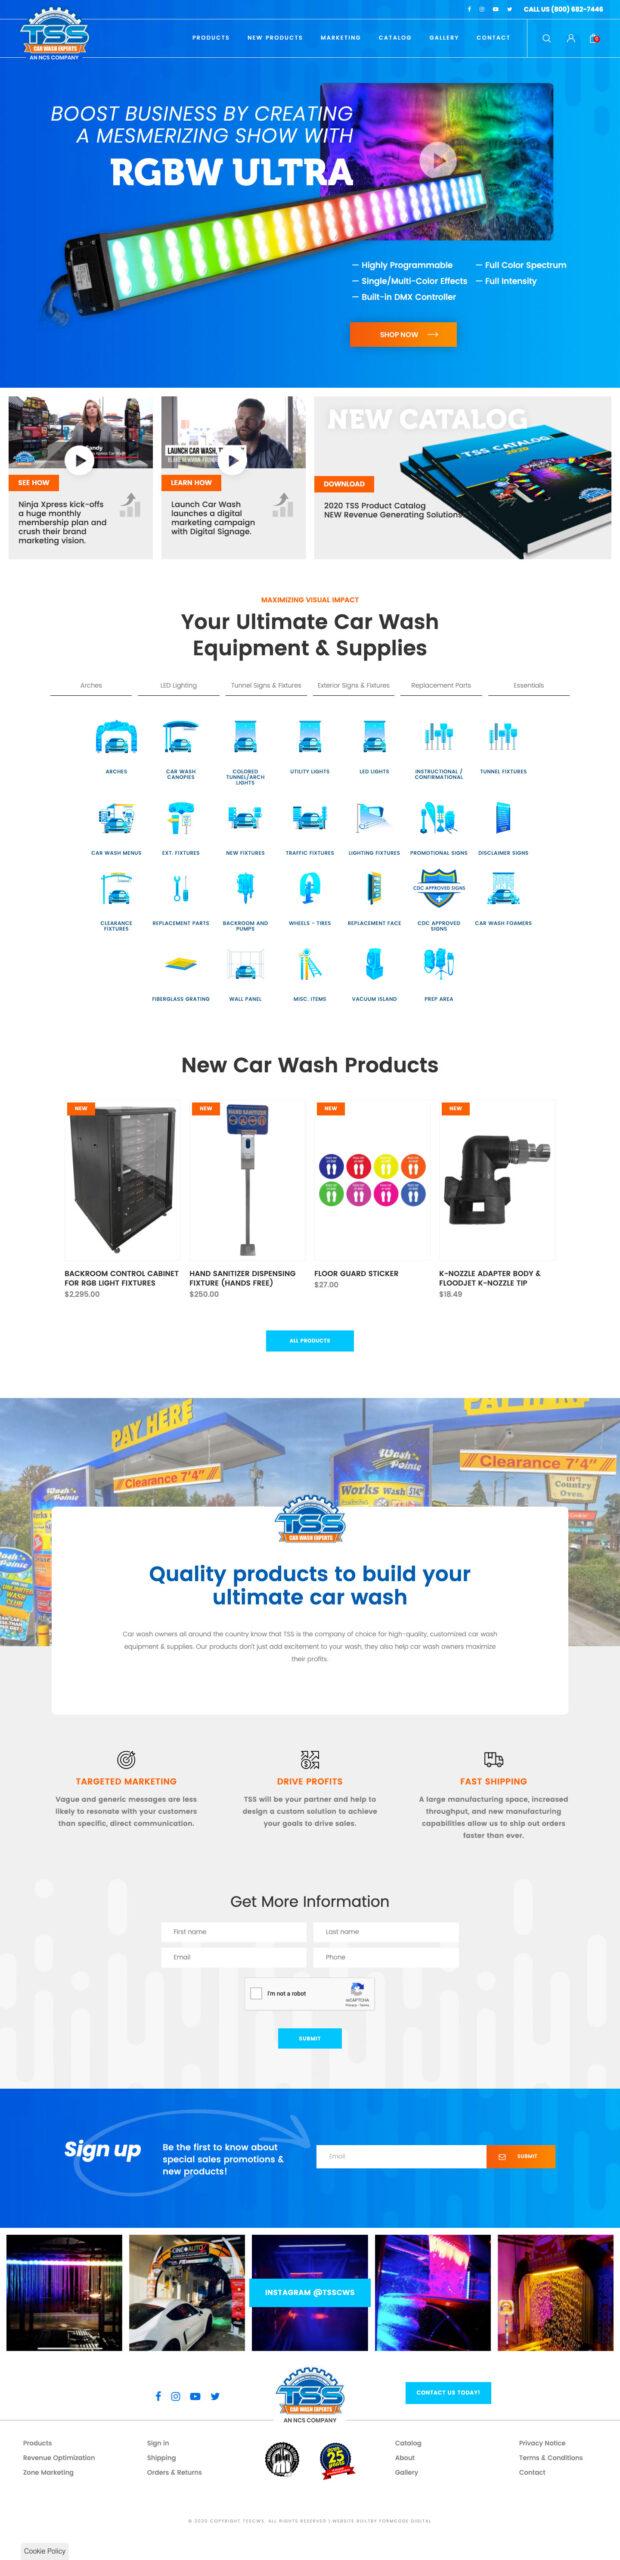 TSS car wash marketing website